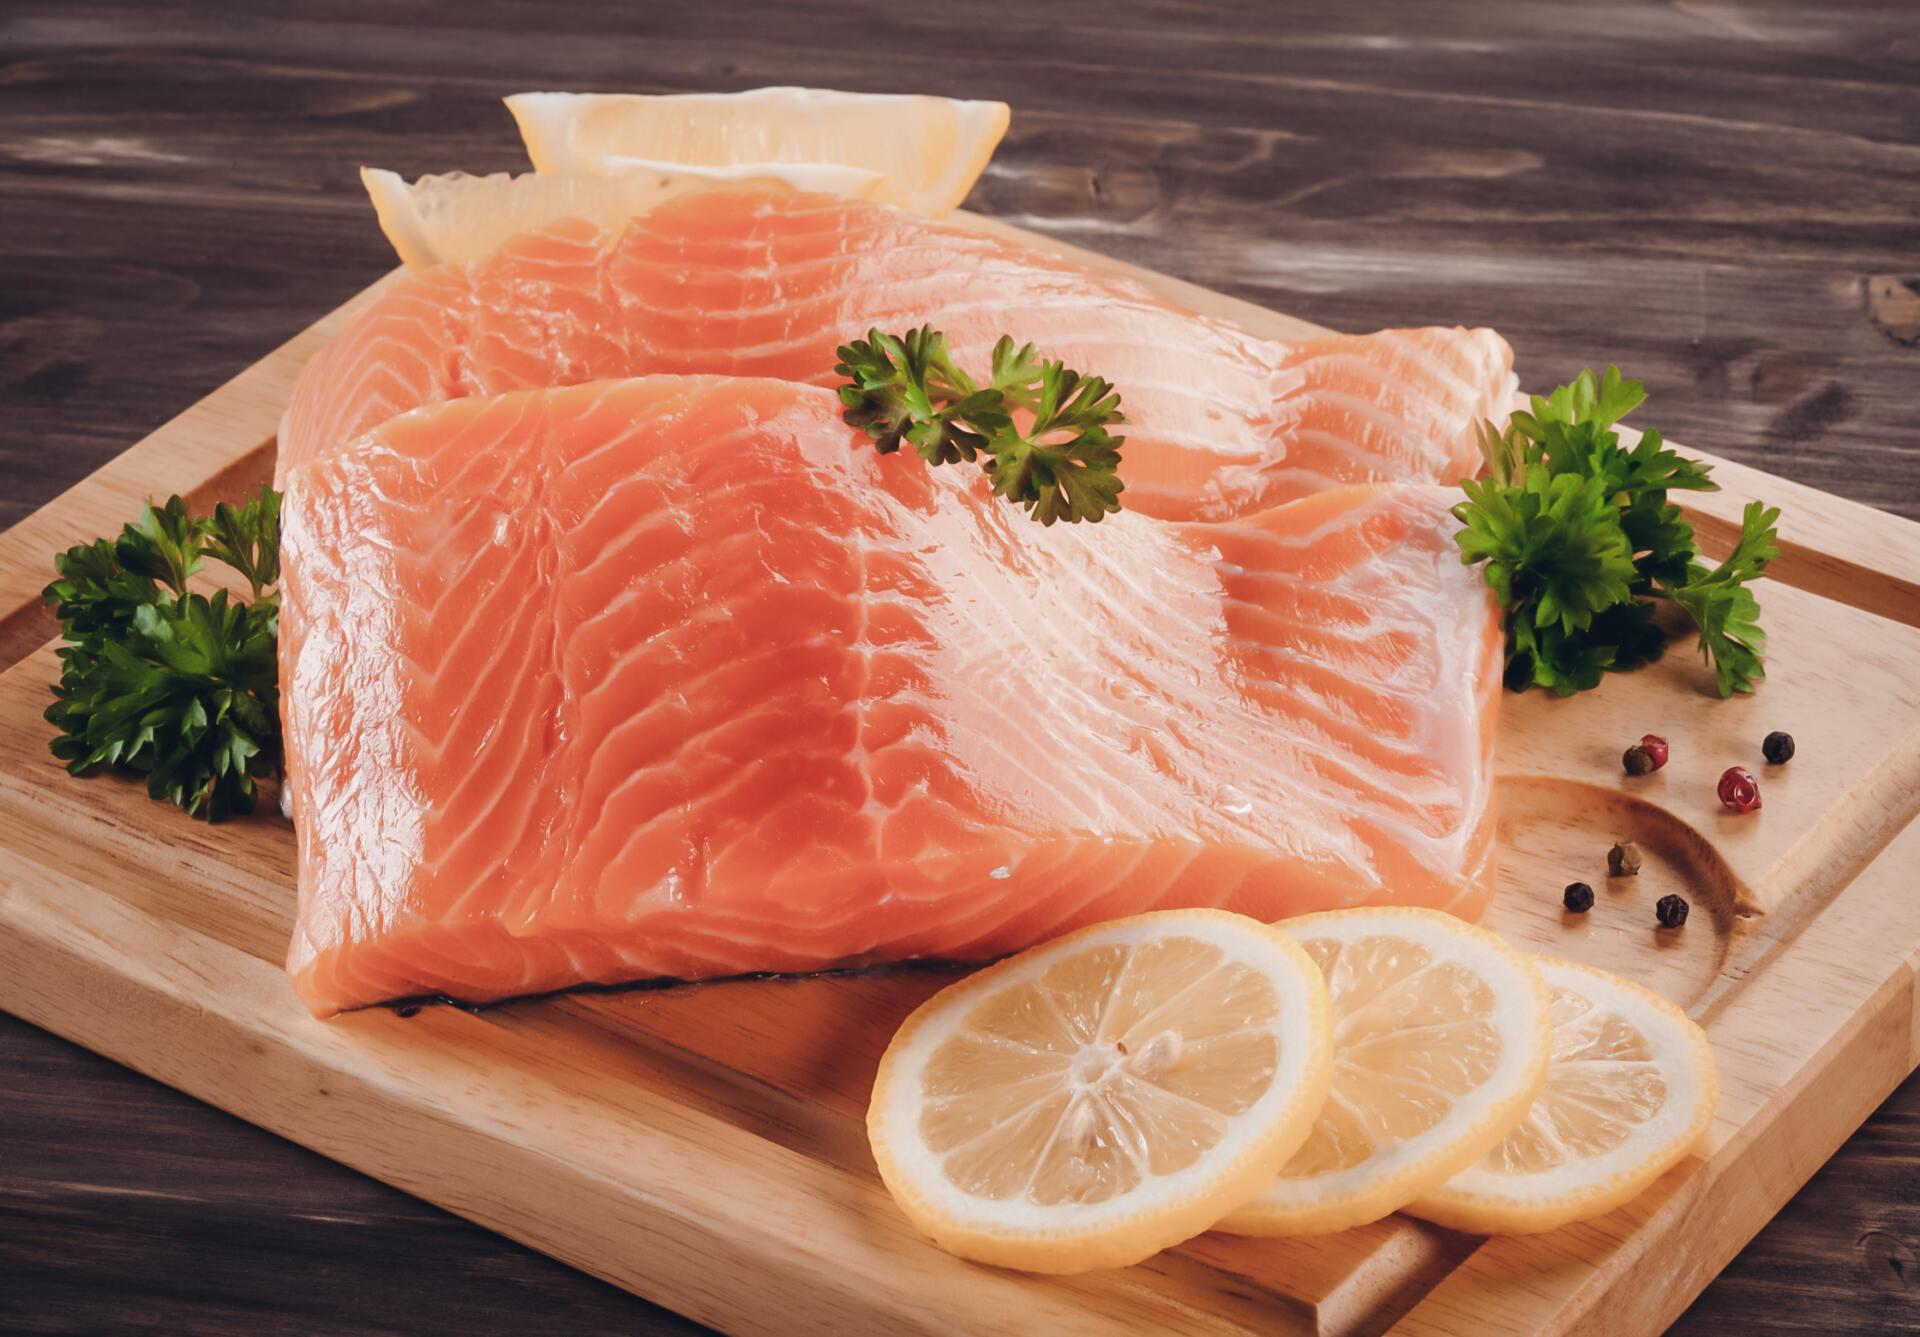 Salmon (sickle cell crisis)